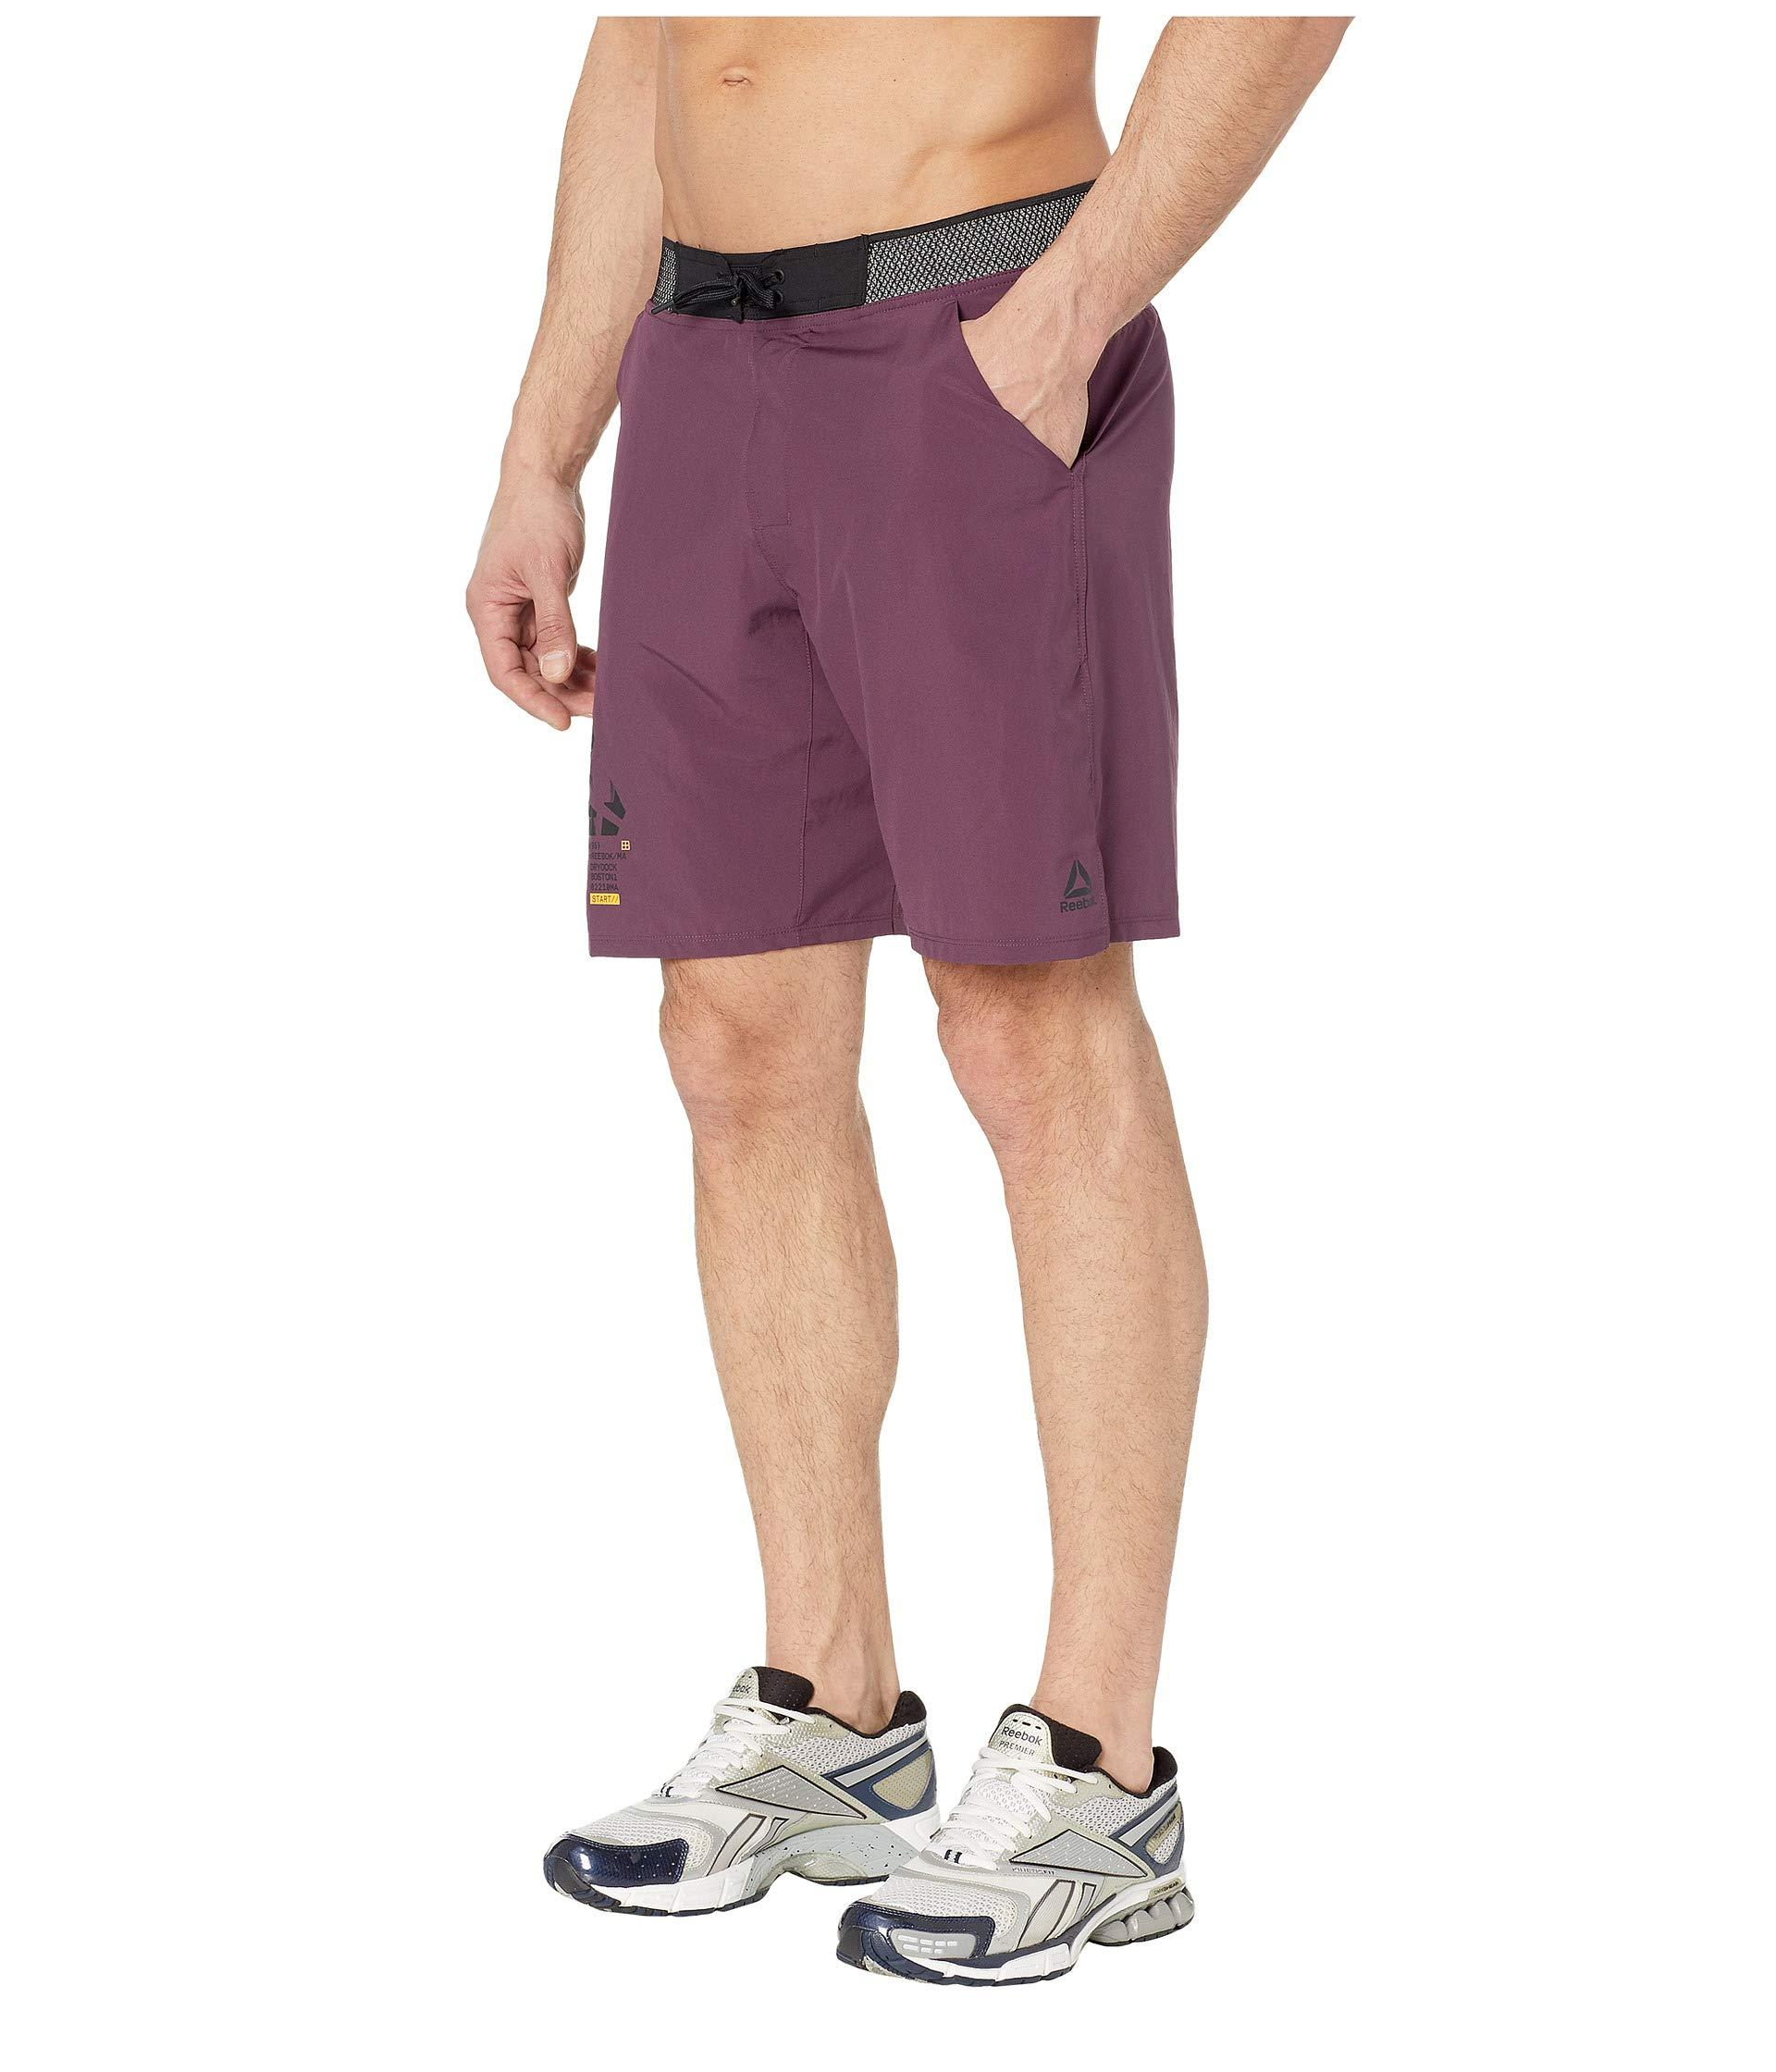 6c441395510a Lyst - Reebok Epic Lightweight Shorts in Purple for Men